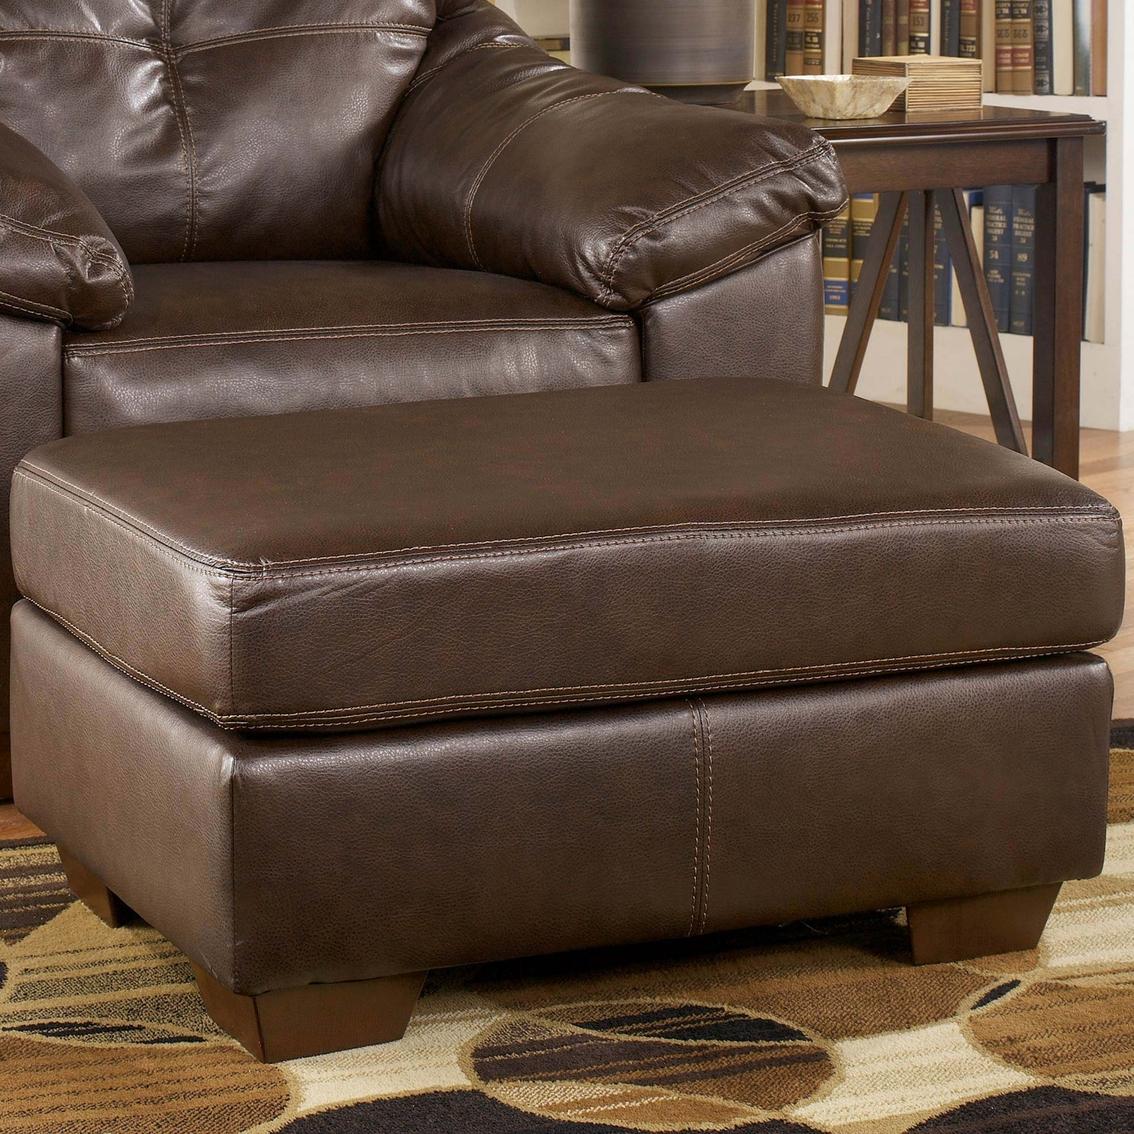 Ashley Furniture Cary Nc